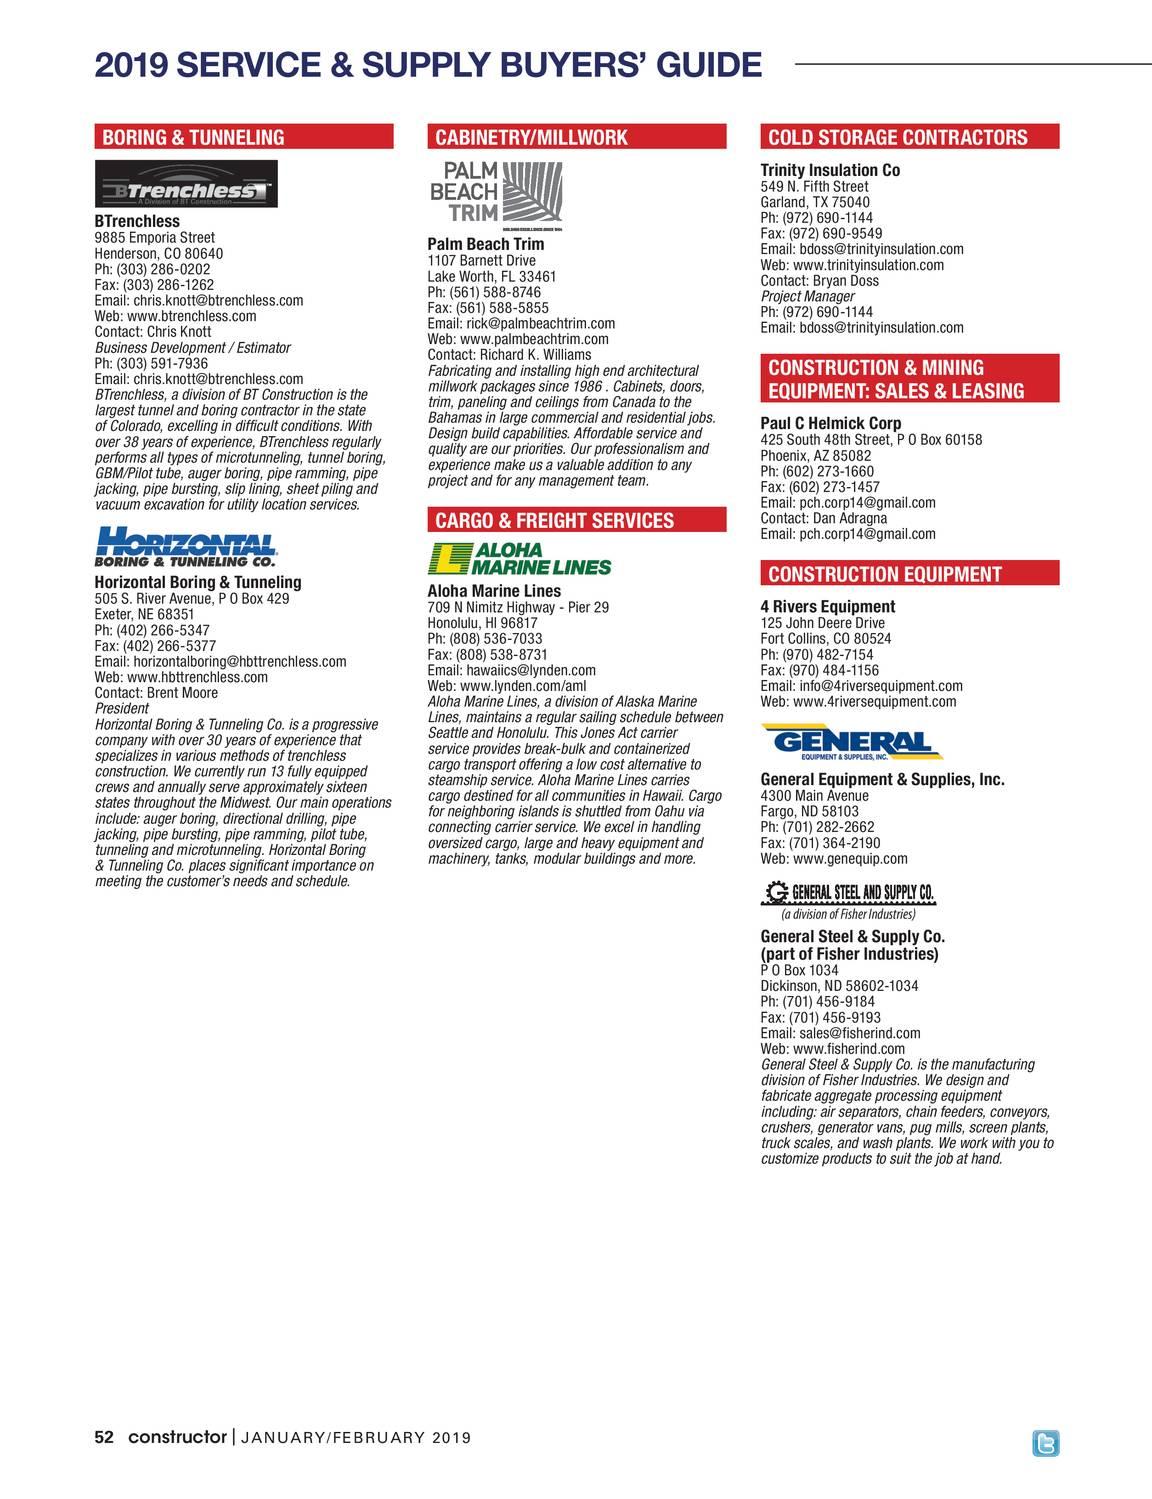 Constructor Magazine (NGCS) - January/February 2019 - page 55